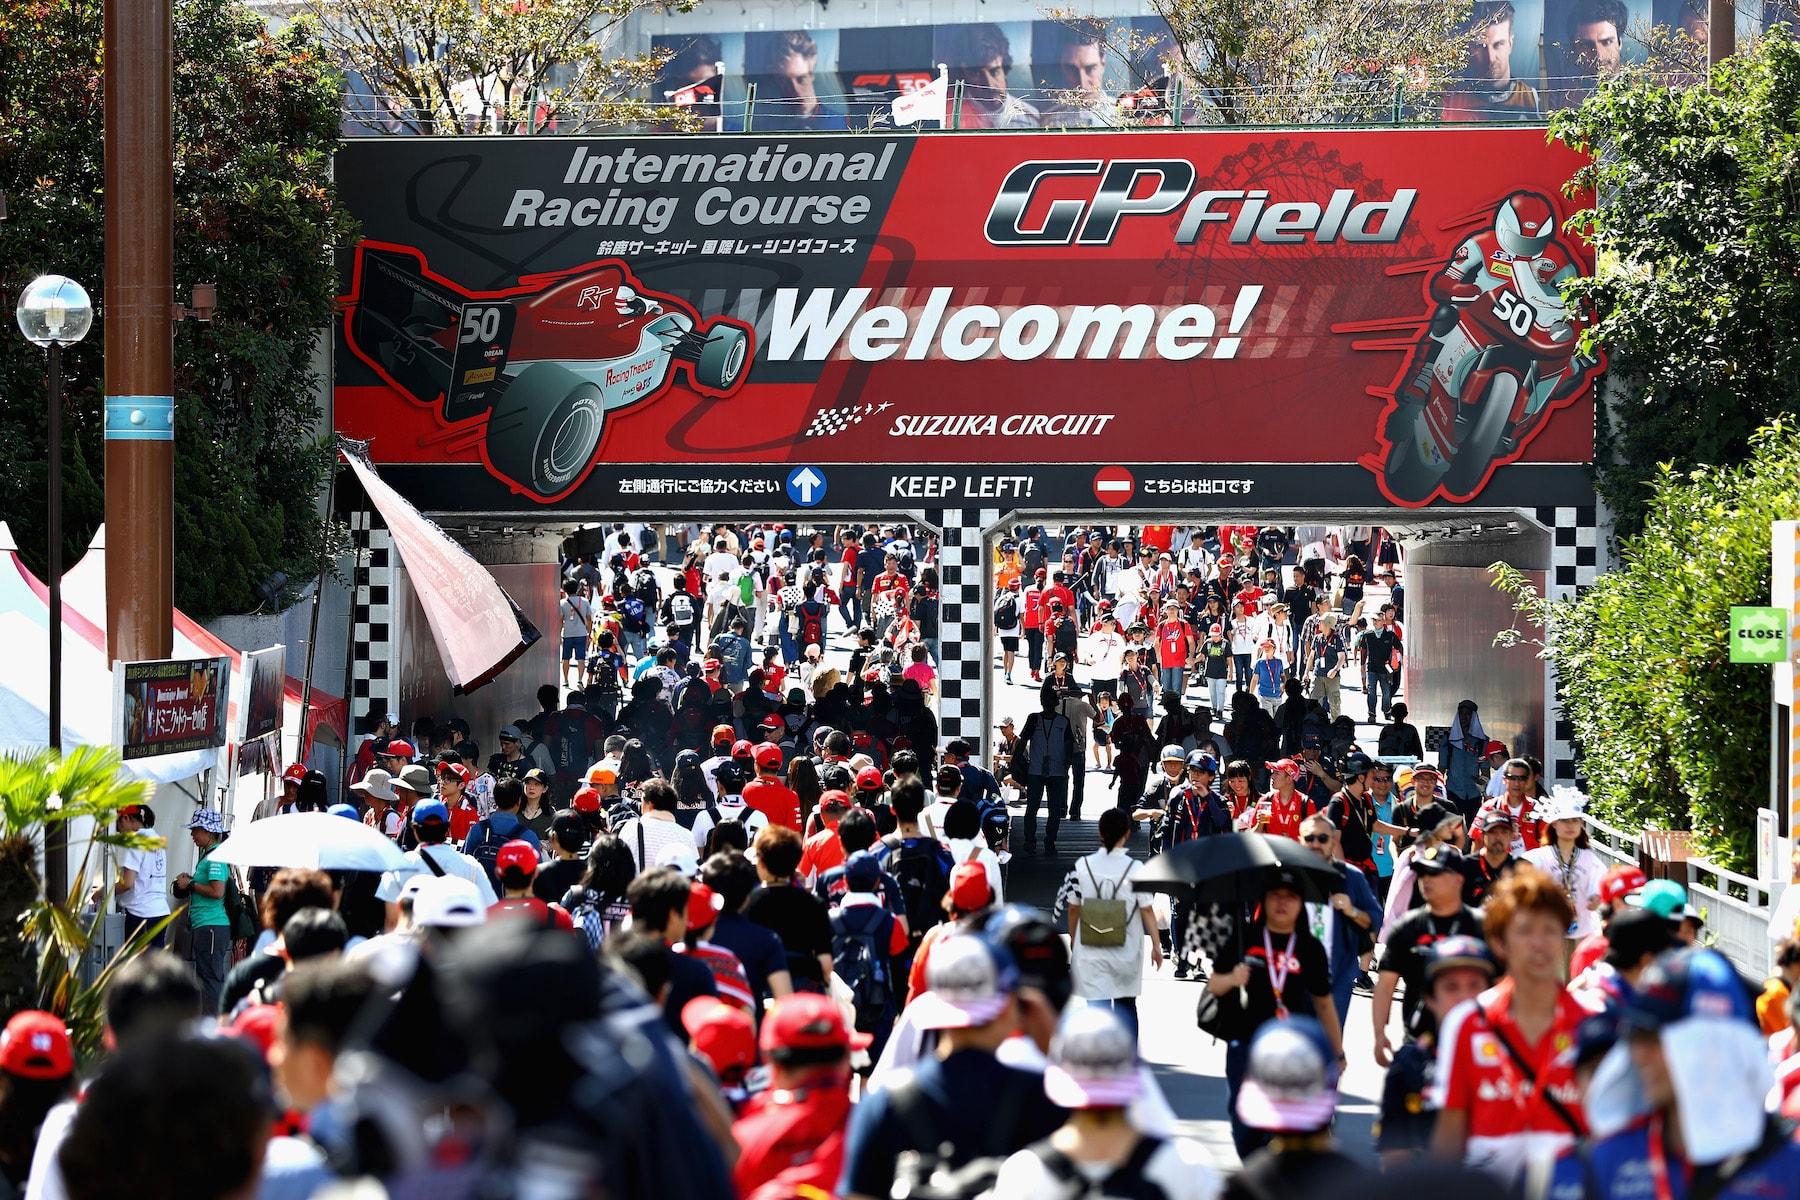 A 2018 Fans entering track | 2018 Japanese GP 1 copy.jpg